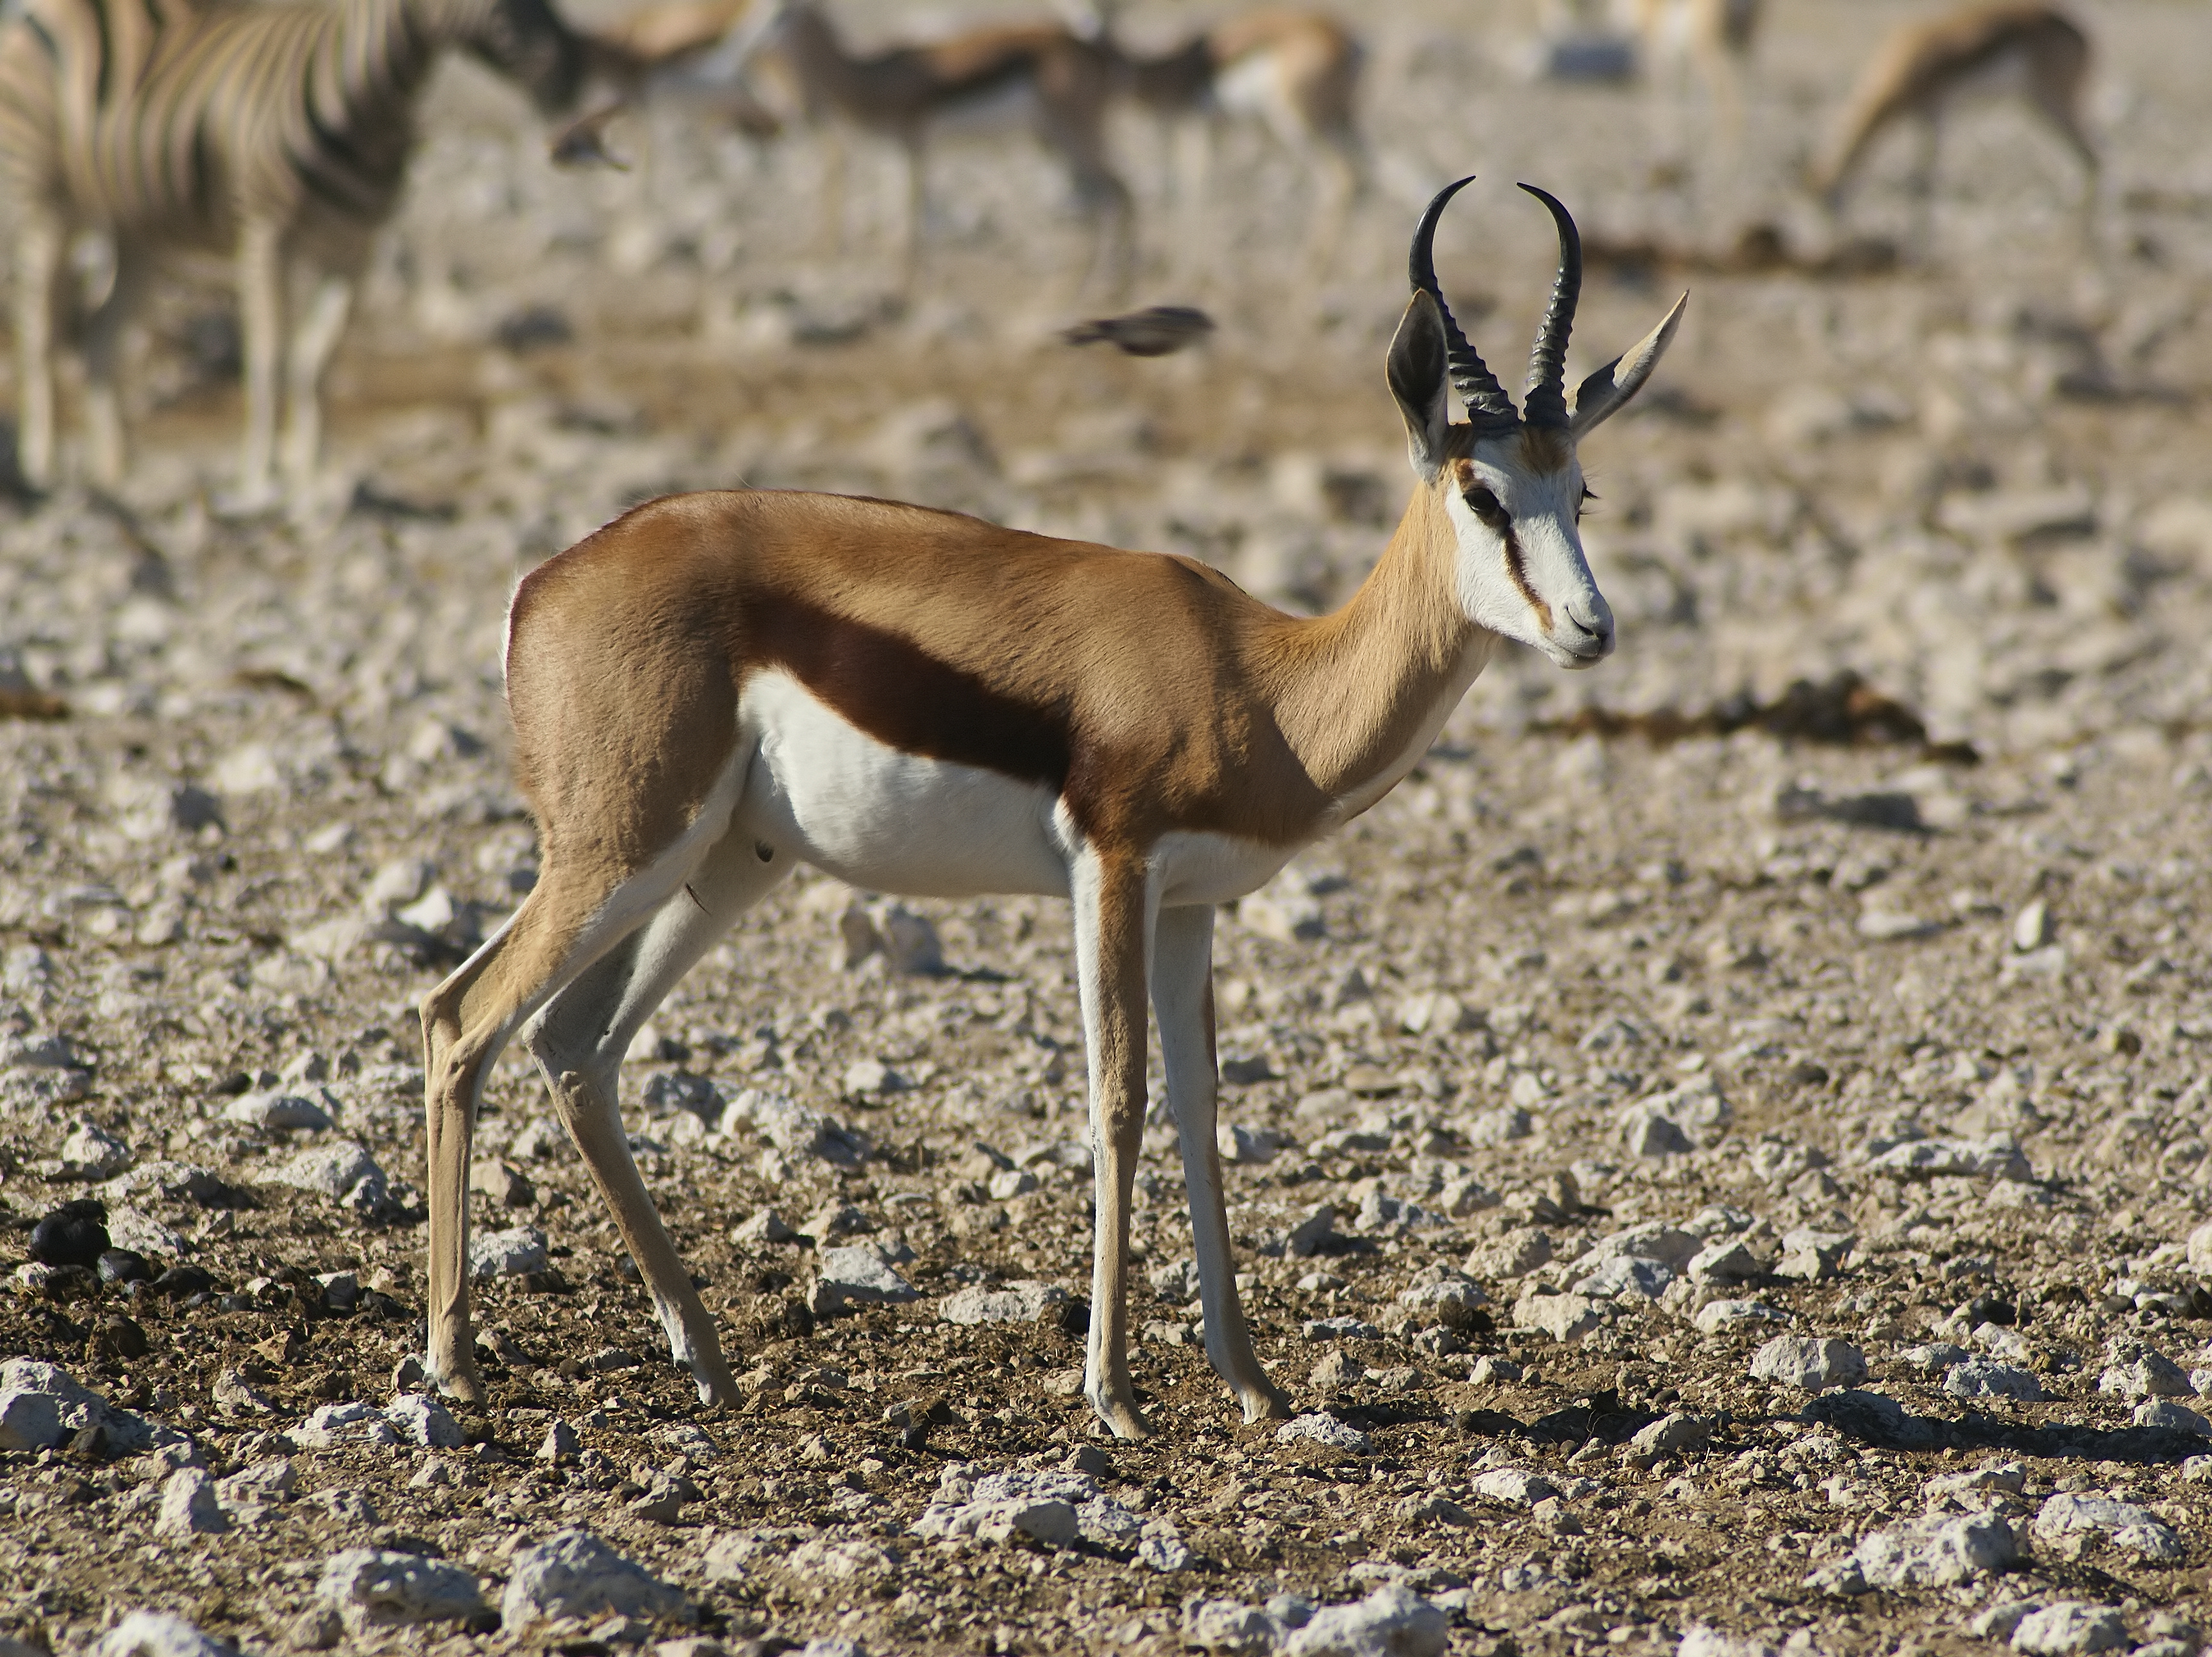 File:Antidorcas marsupialis 2.jpg - Wikimedia Commons